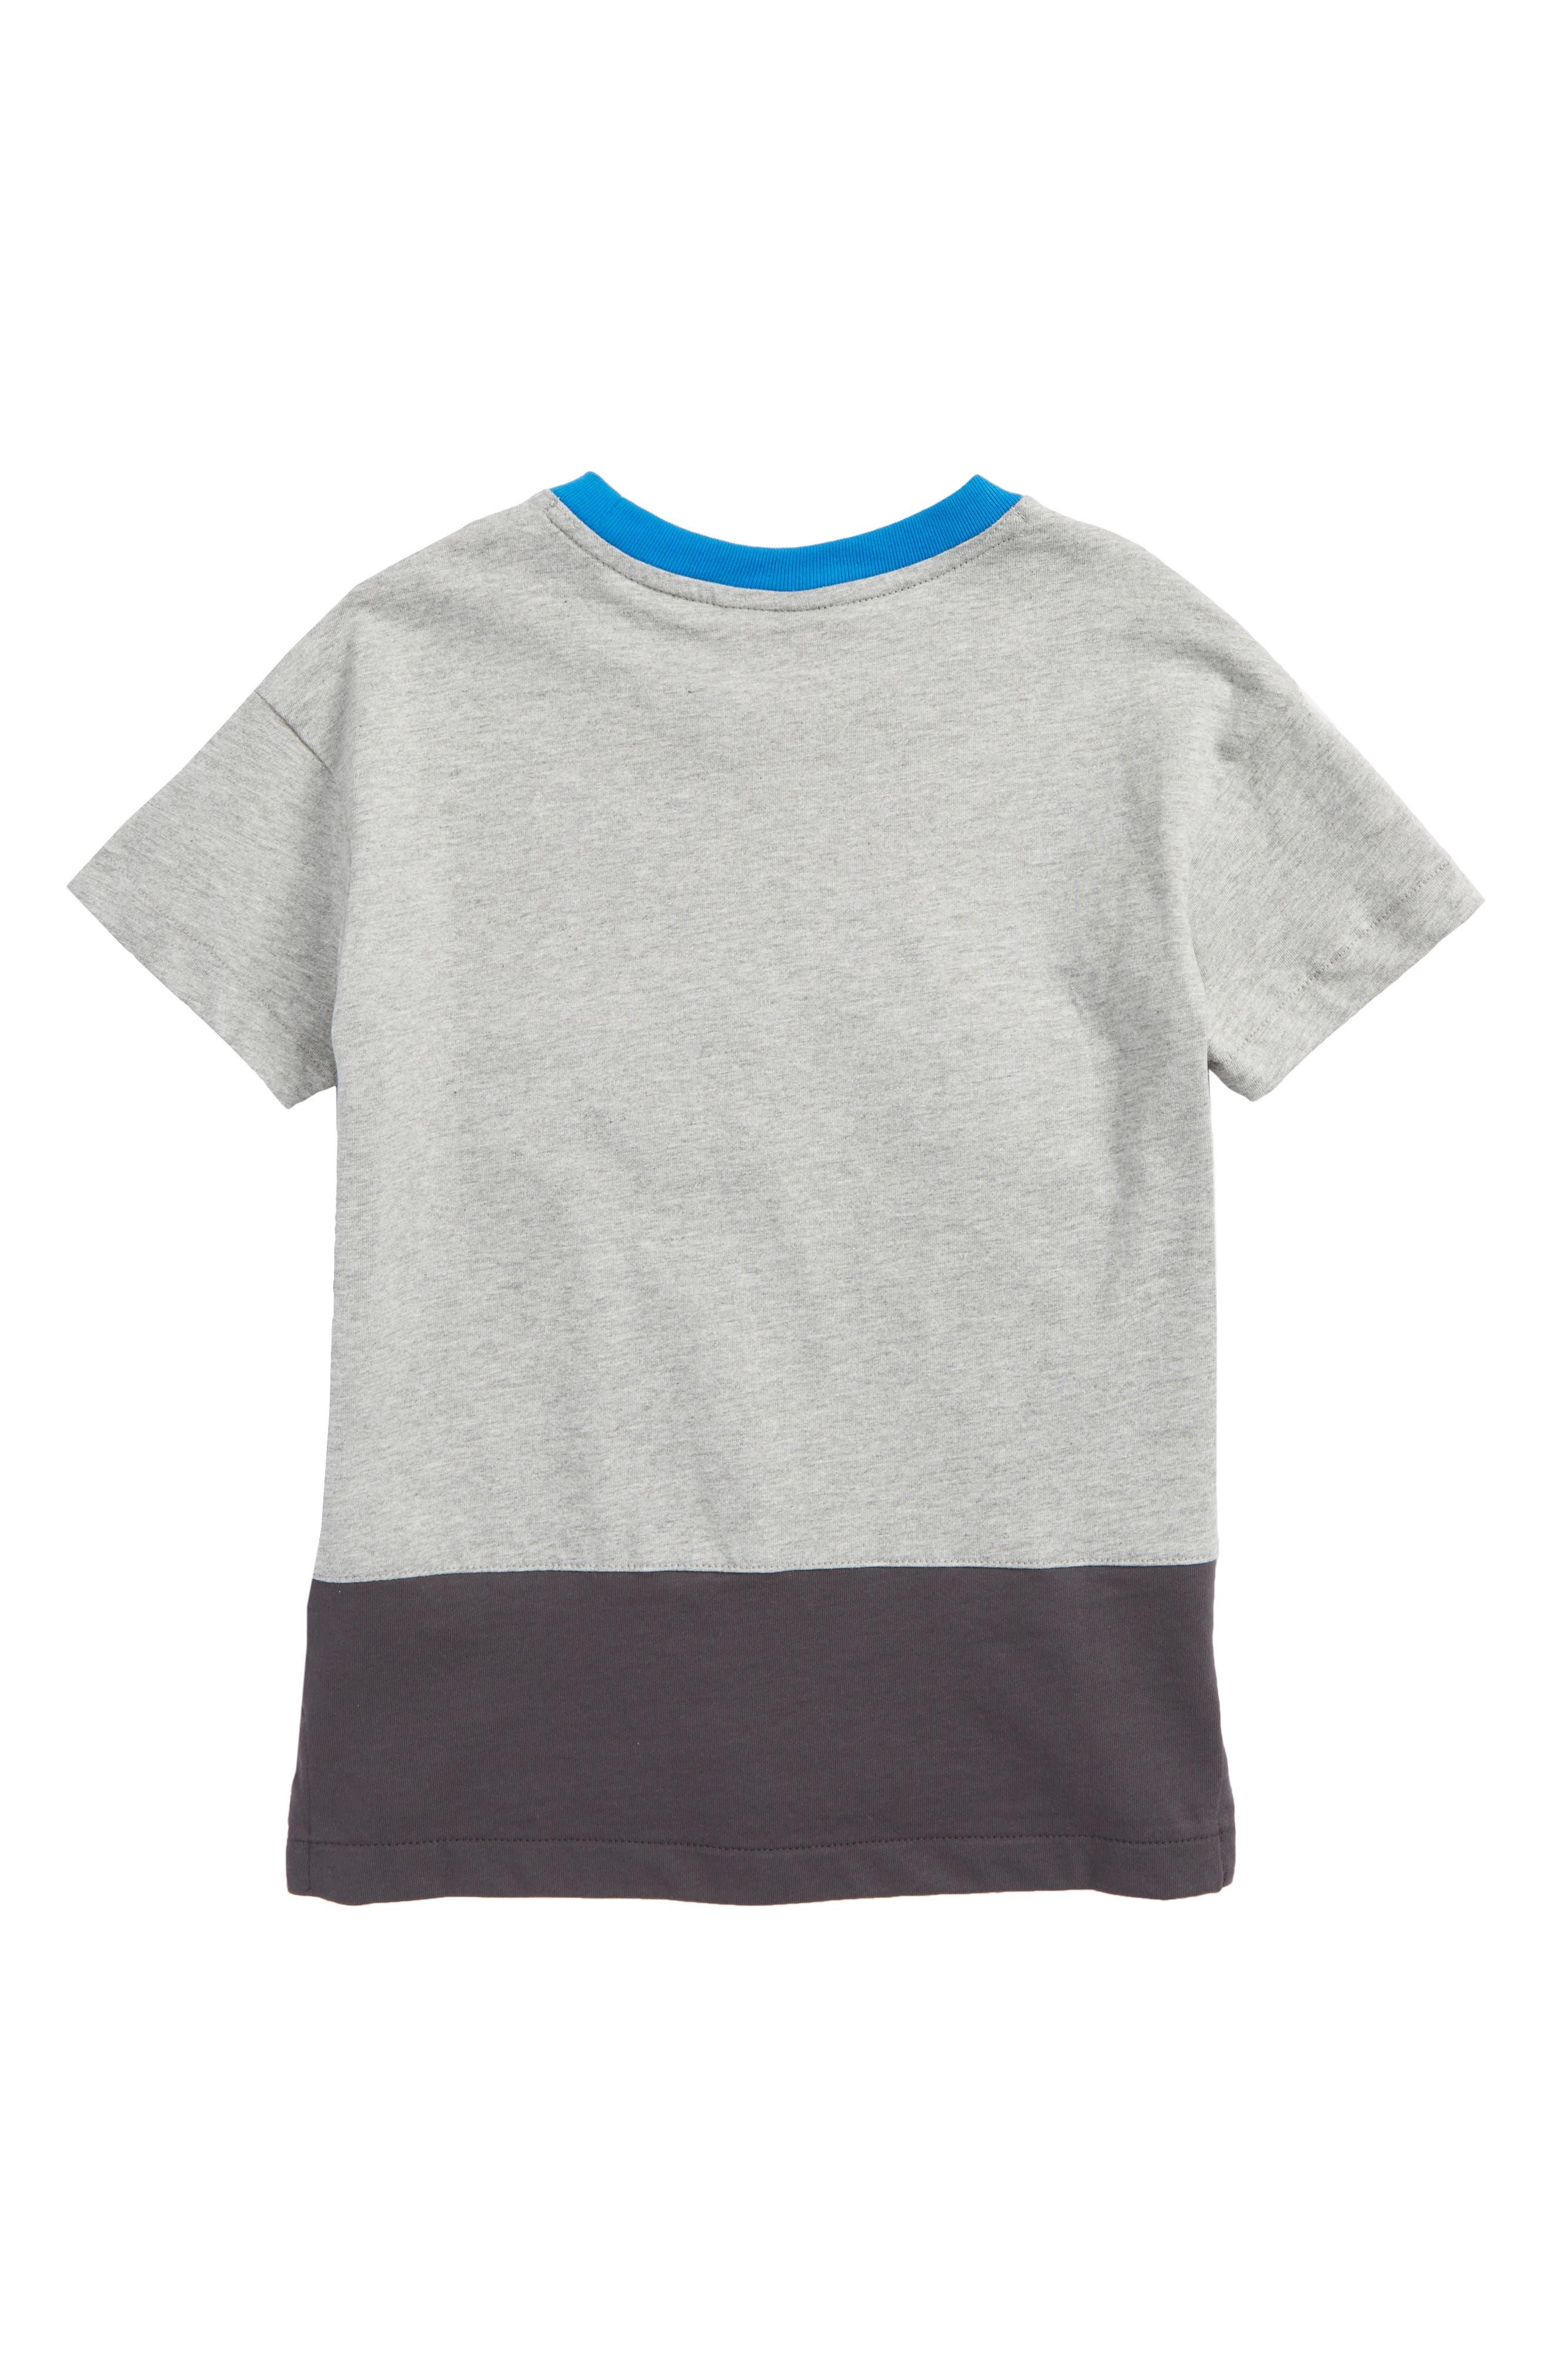 Air Shirt,                             Alternate thumbnail 7, color,